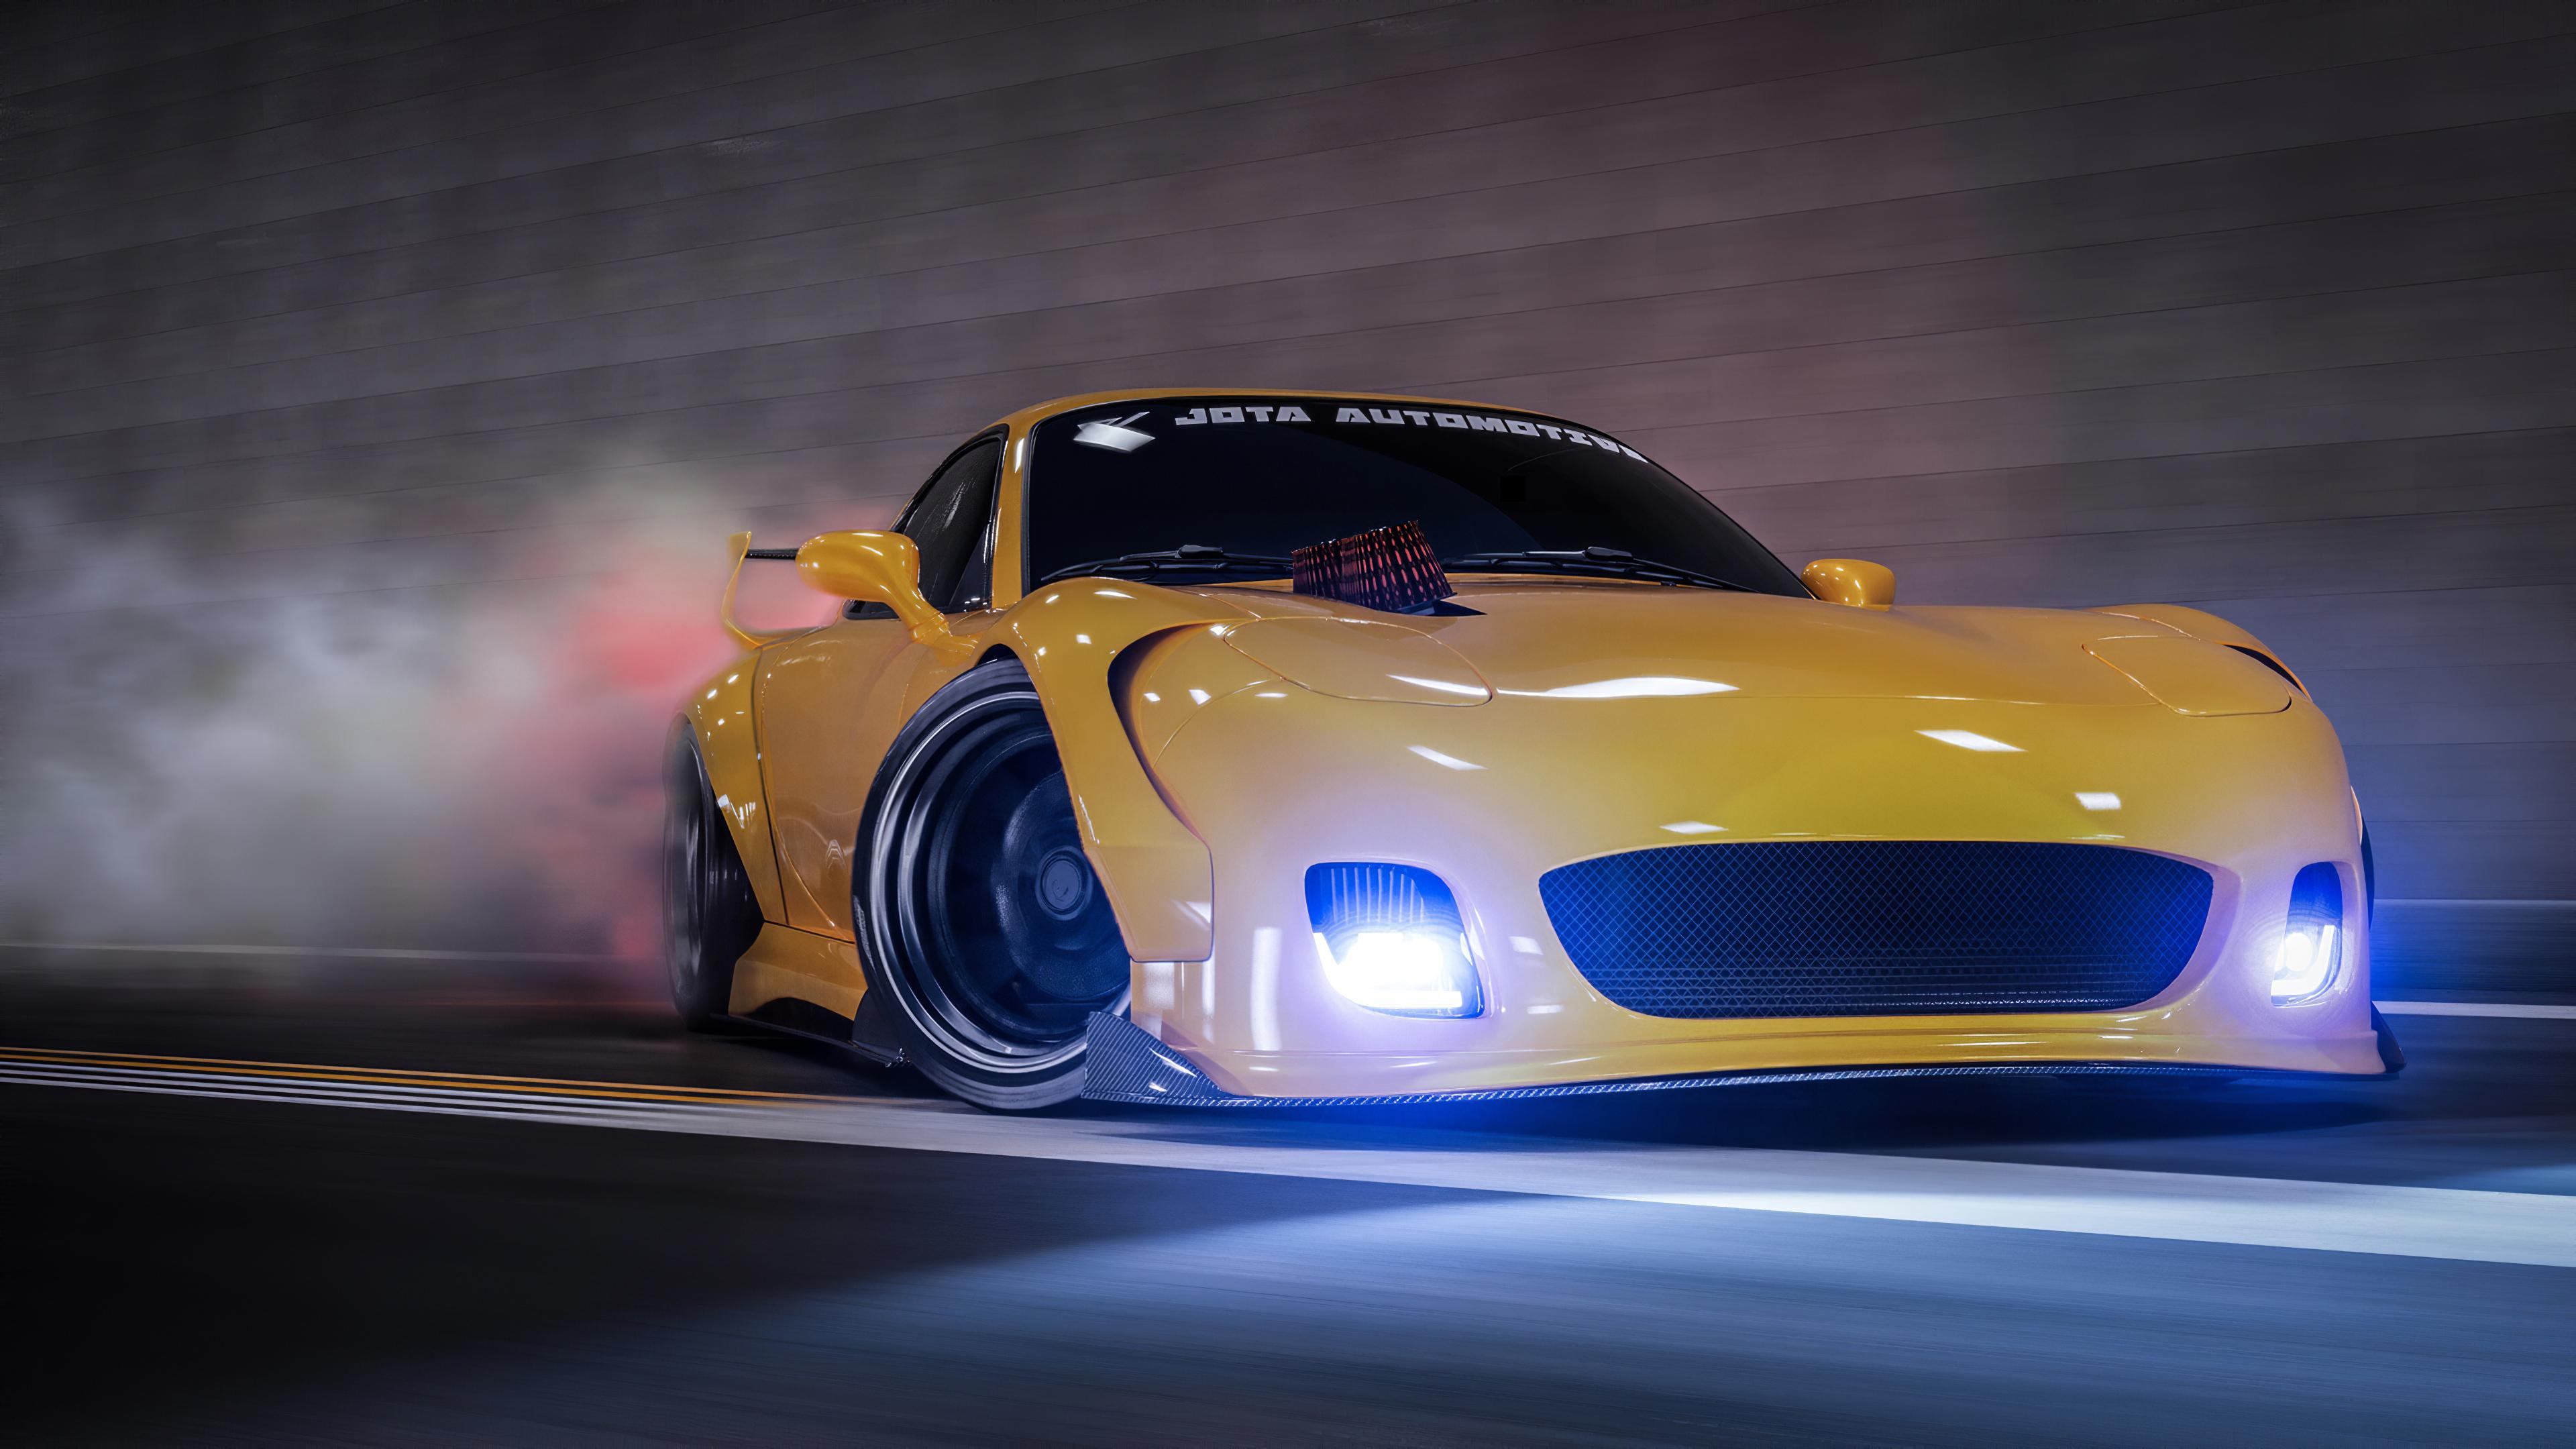 yellow mazda rx7 drifting 1579649252 - Yellow Mazda Rx7 Drifting -